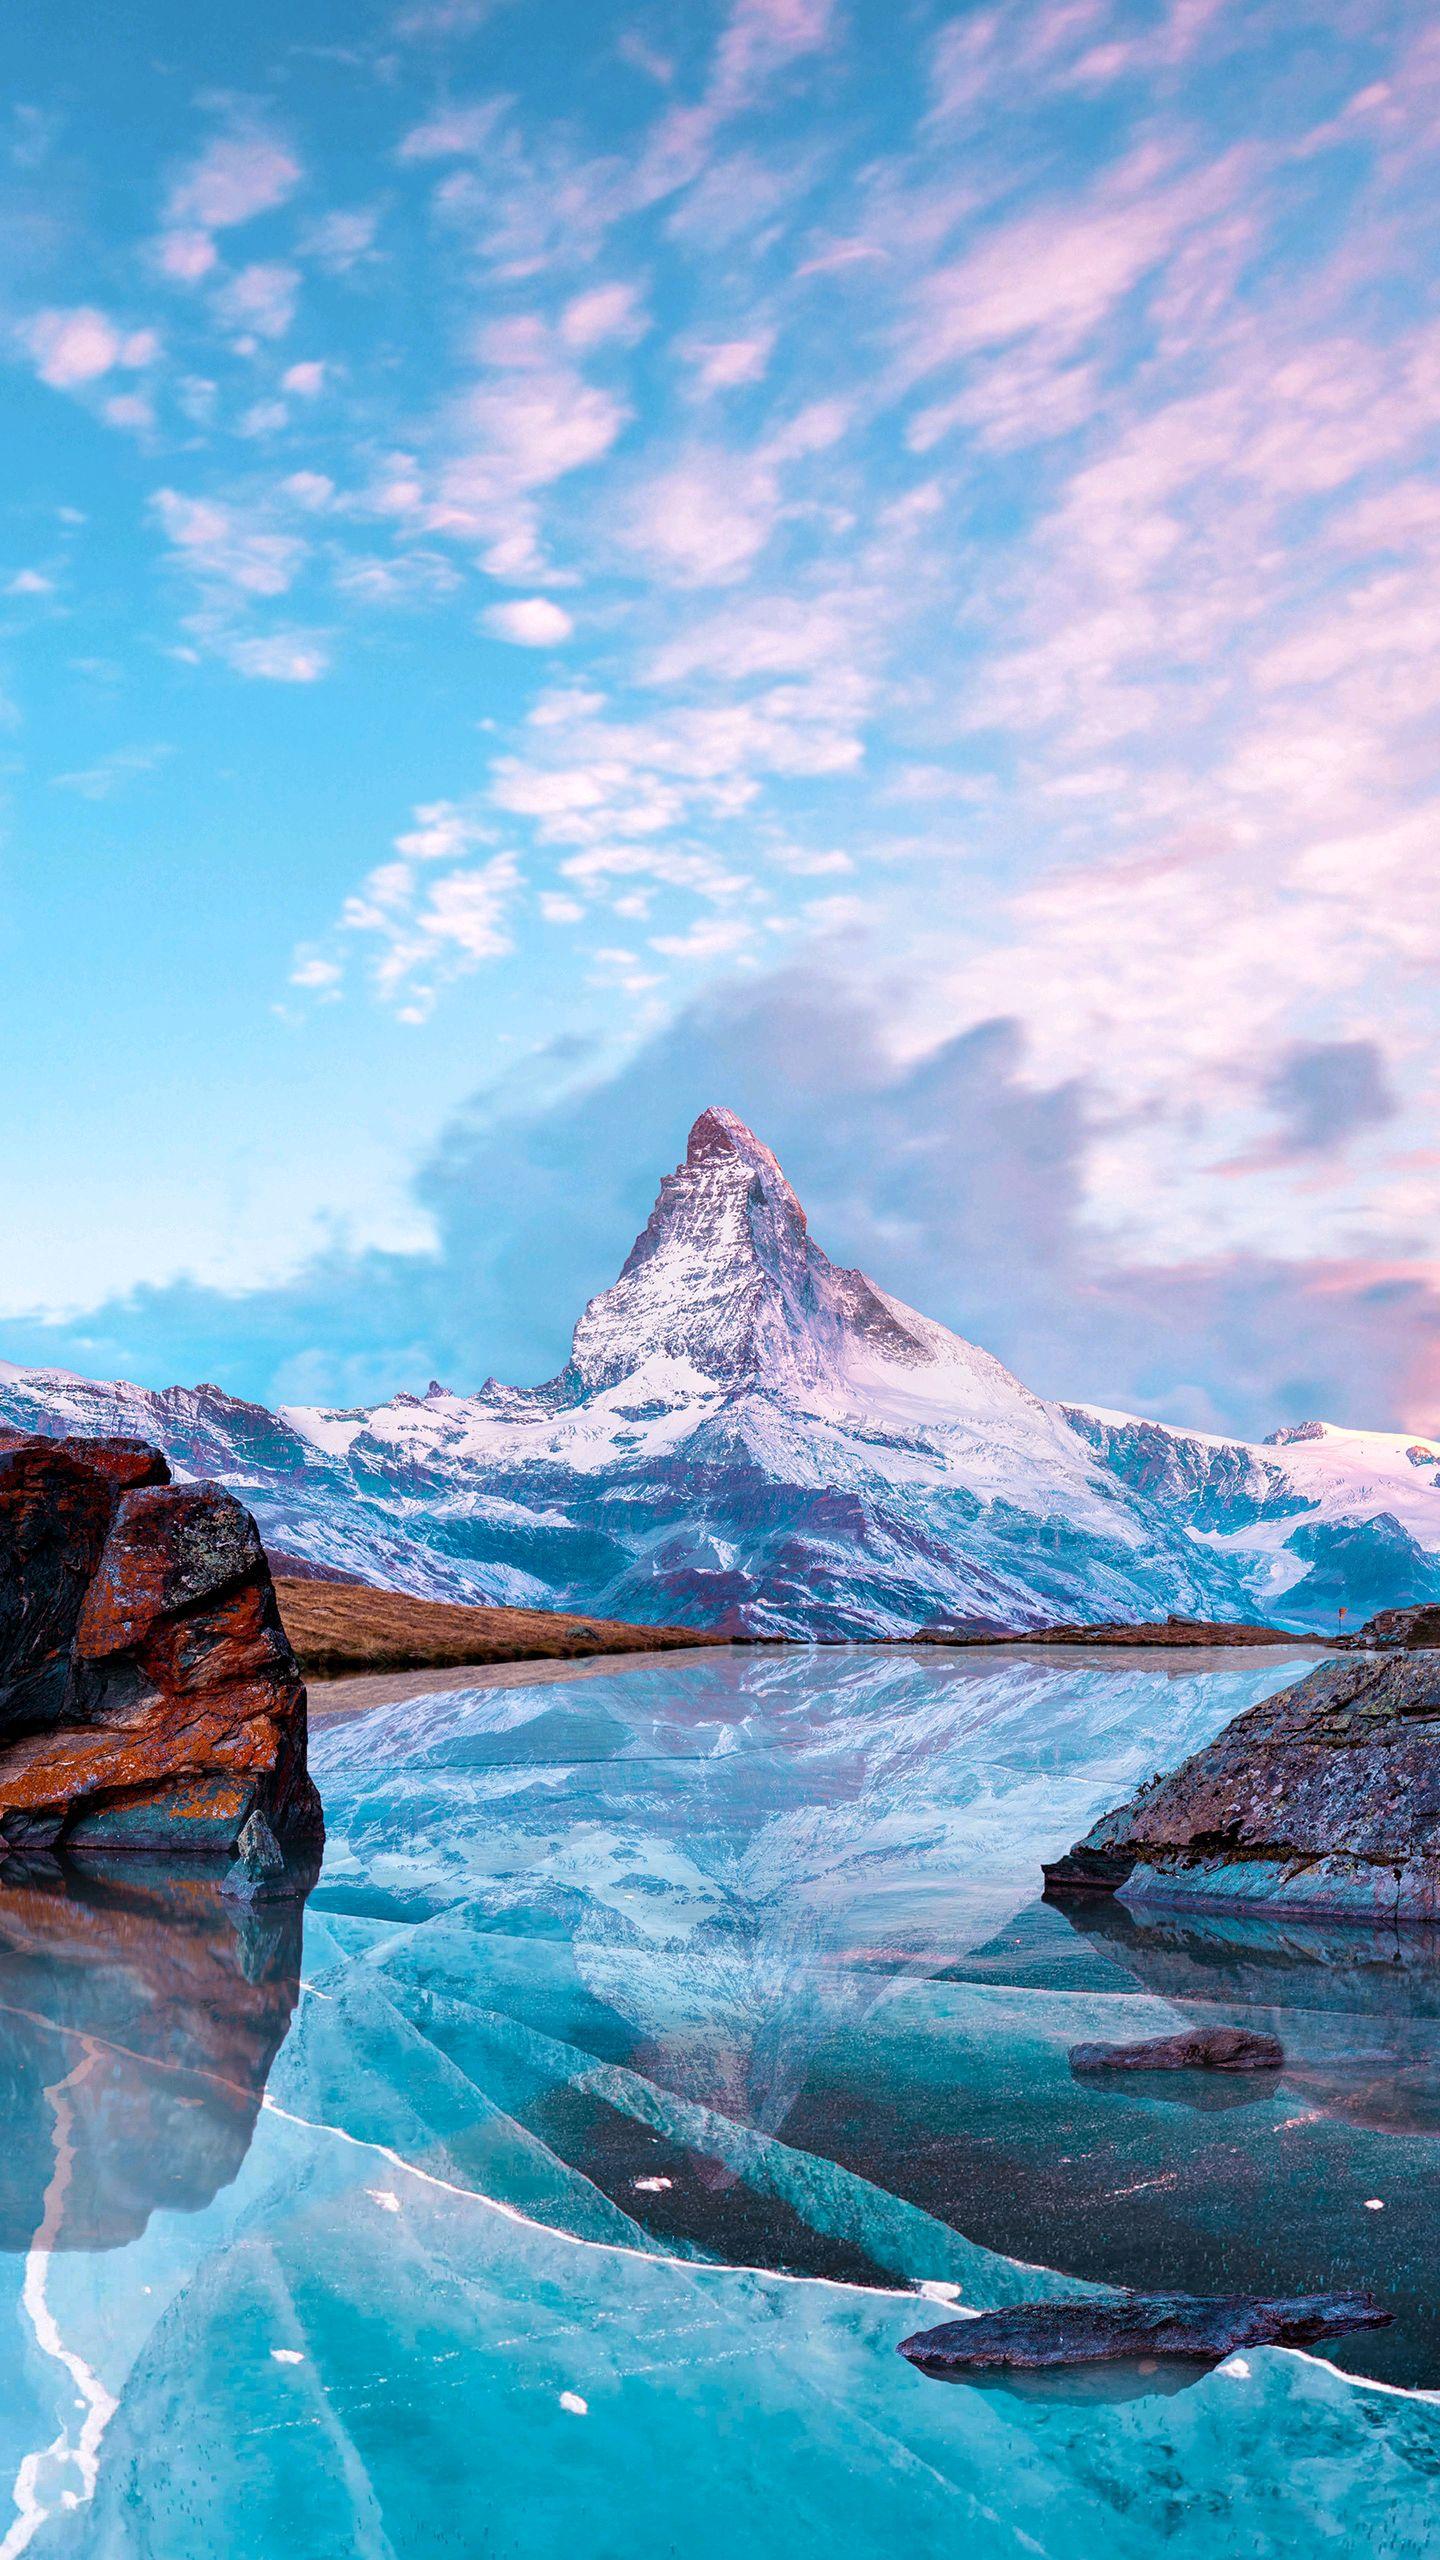 Alps Mountain Frozen Winters Sky iPhone Wallpaper